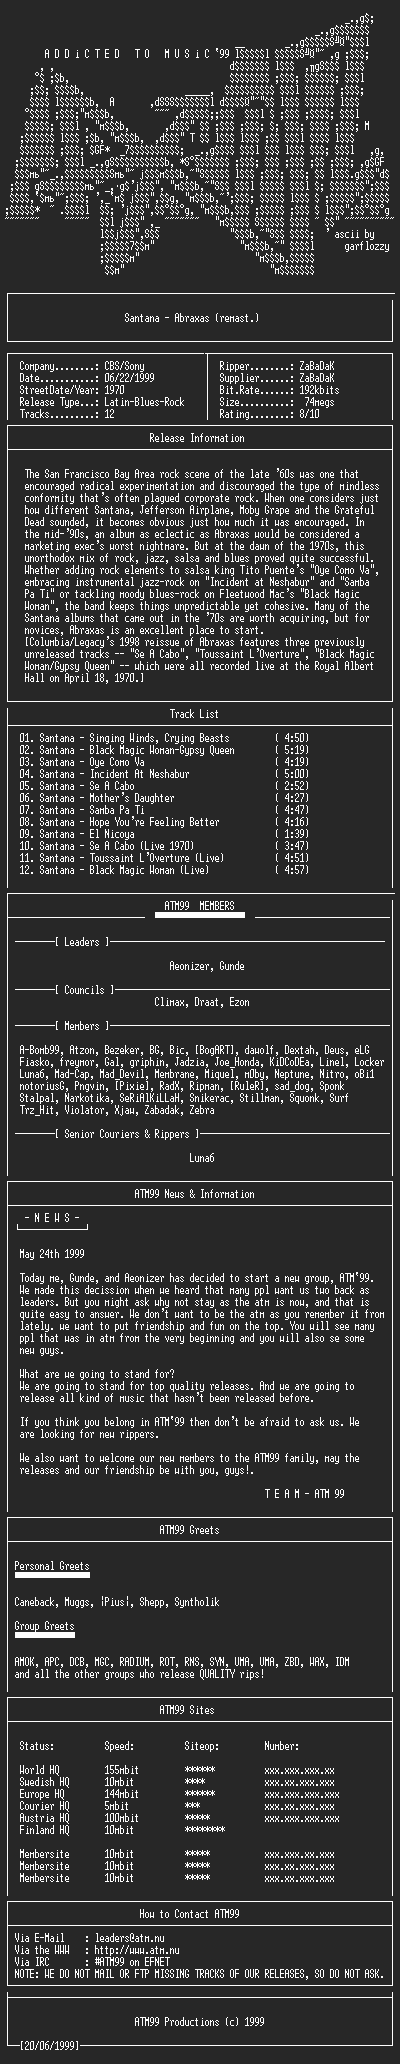 NFO file for Santana_-_Abraxas_-_(1970)_(remast.)-ATM99